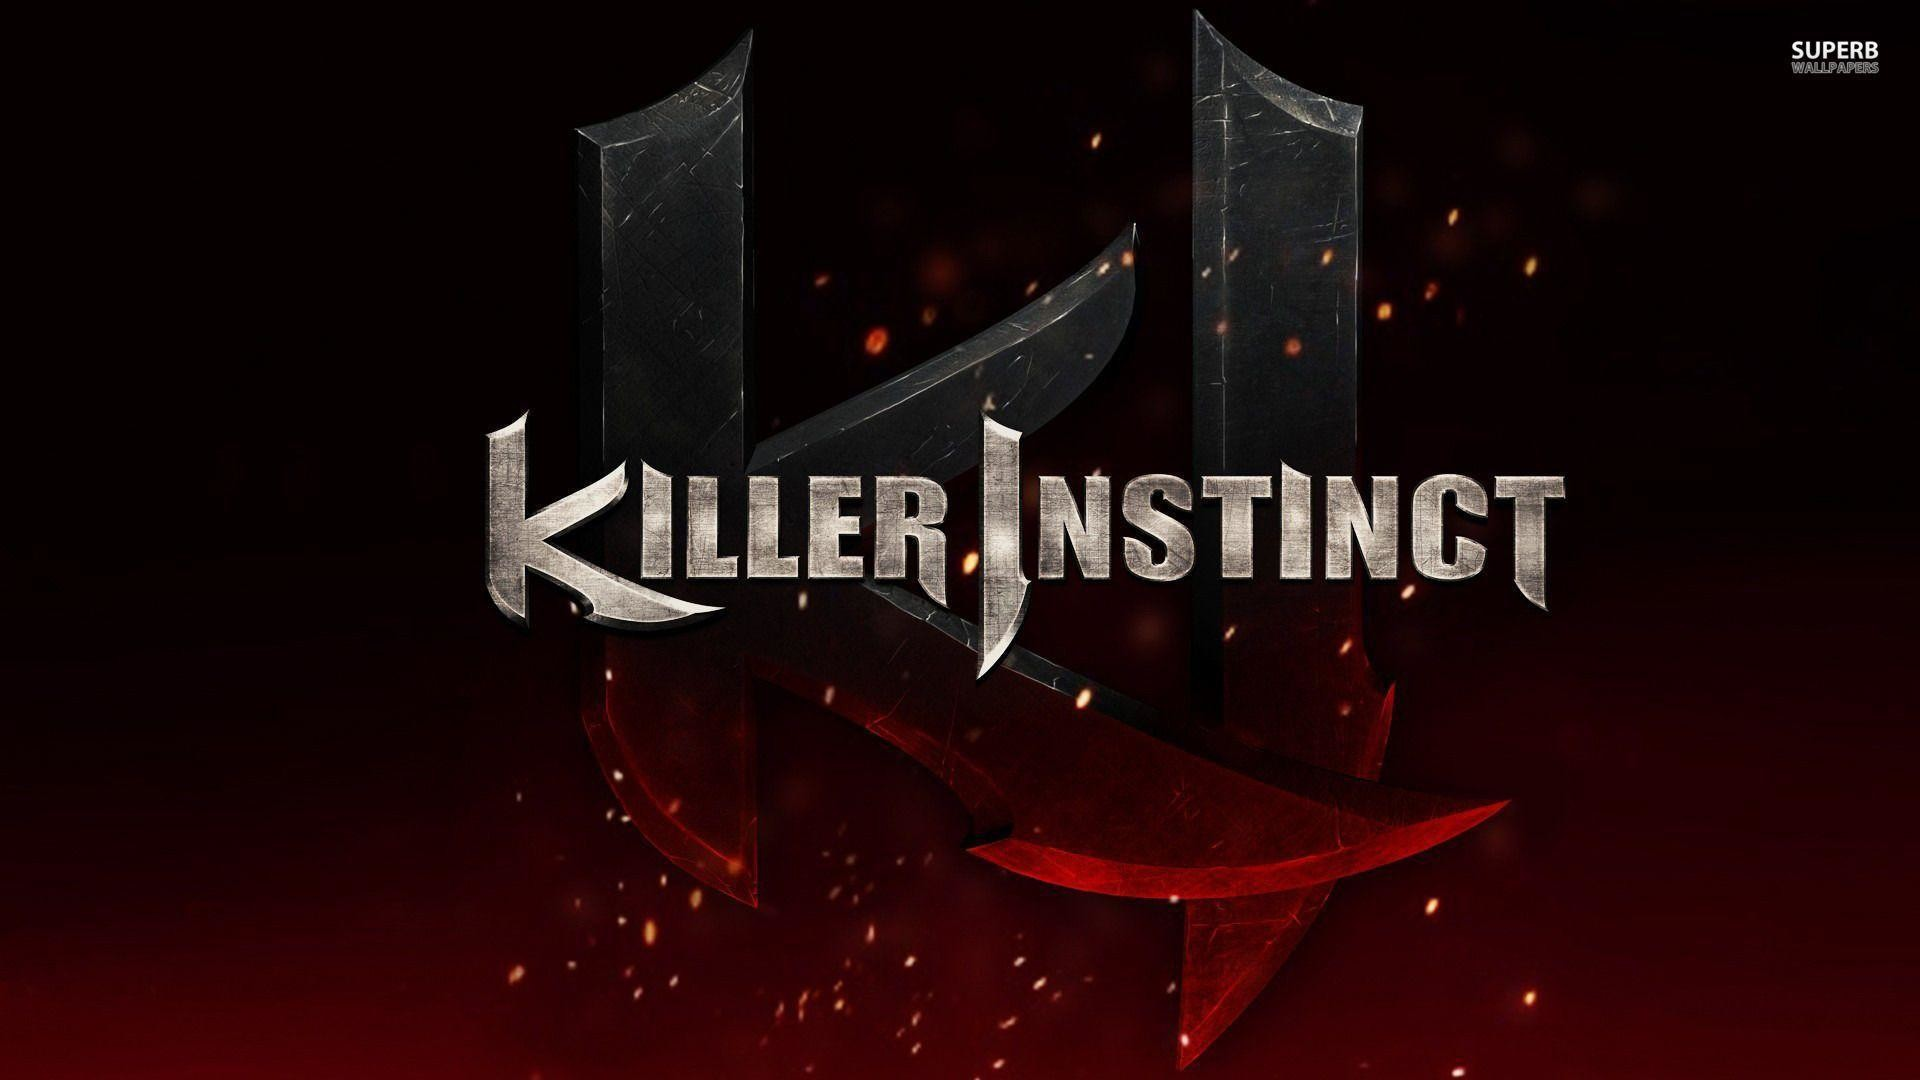 Killer Instinct wallpaper – Game wallpapers – #